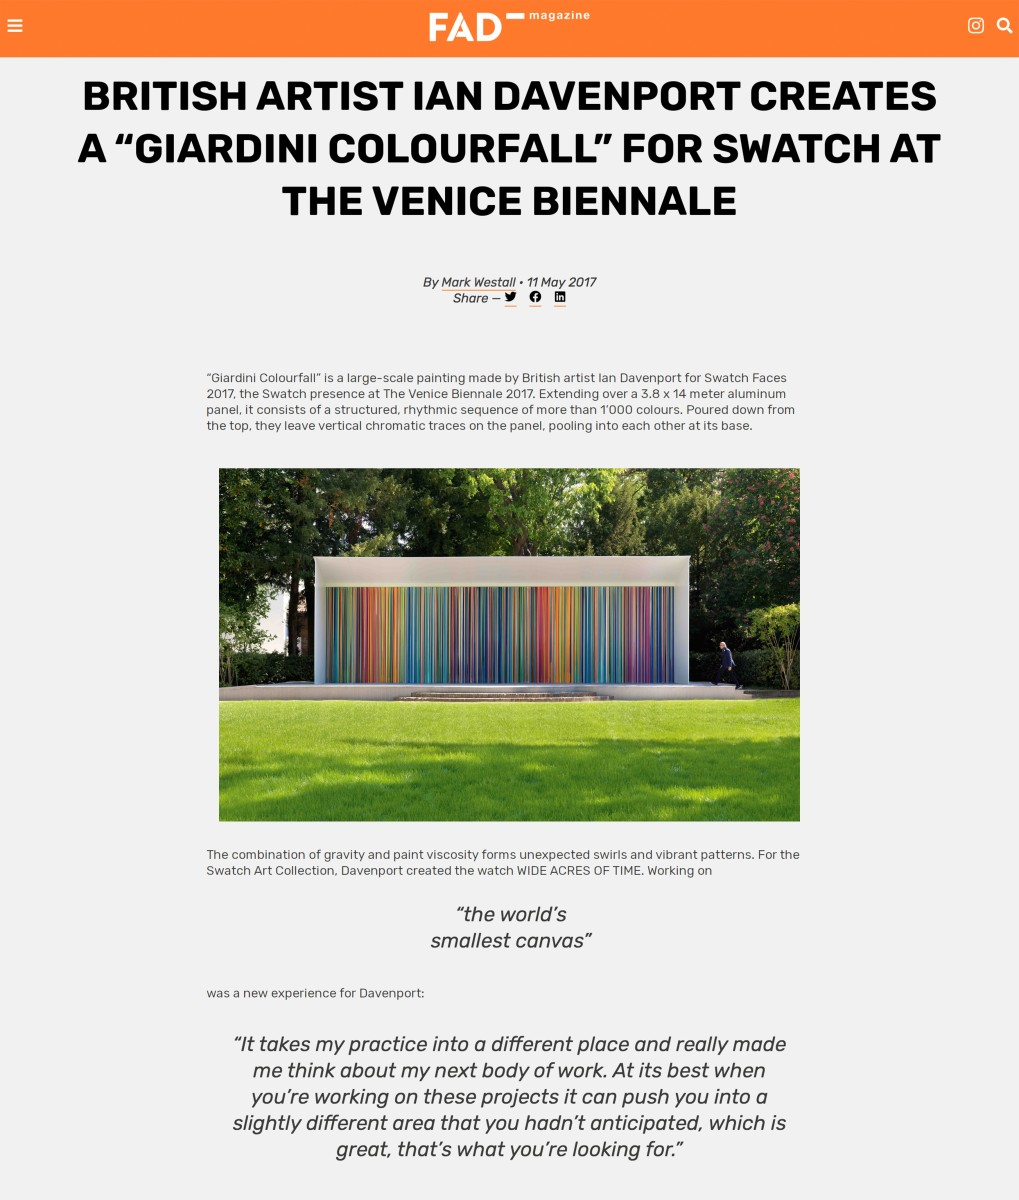 British Artist Ian Davenport creates a 'Giardini Colourfall' for Swatch at the Venice Biennale